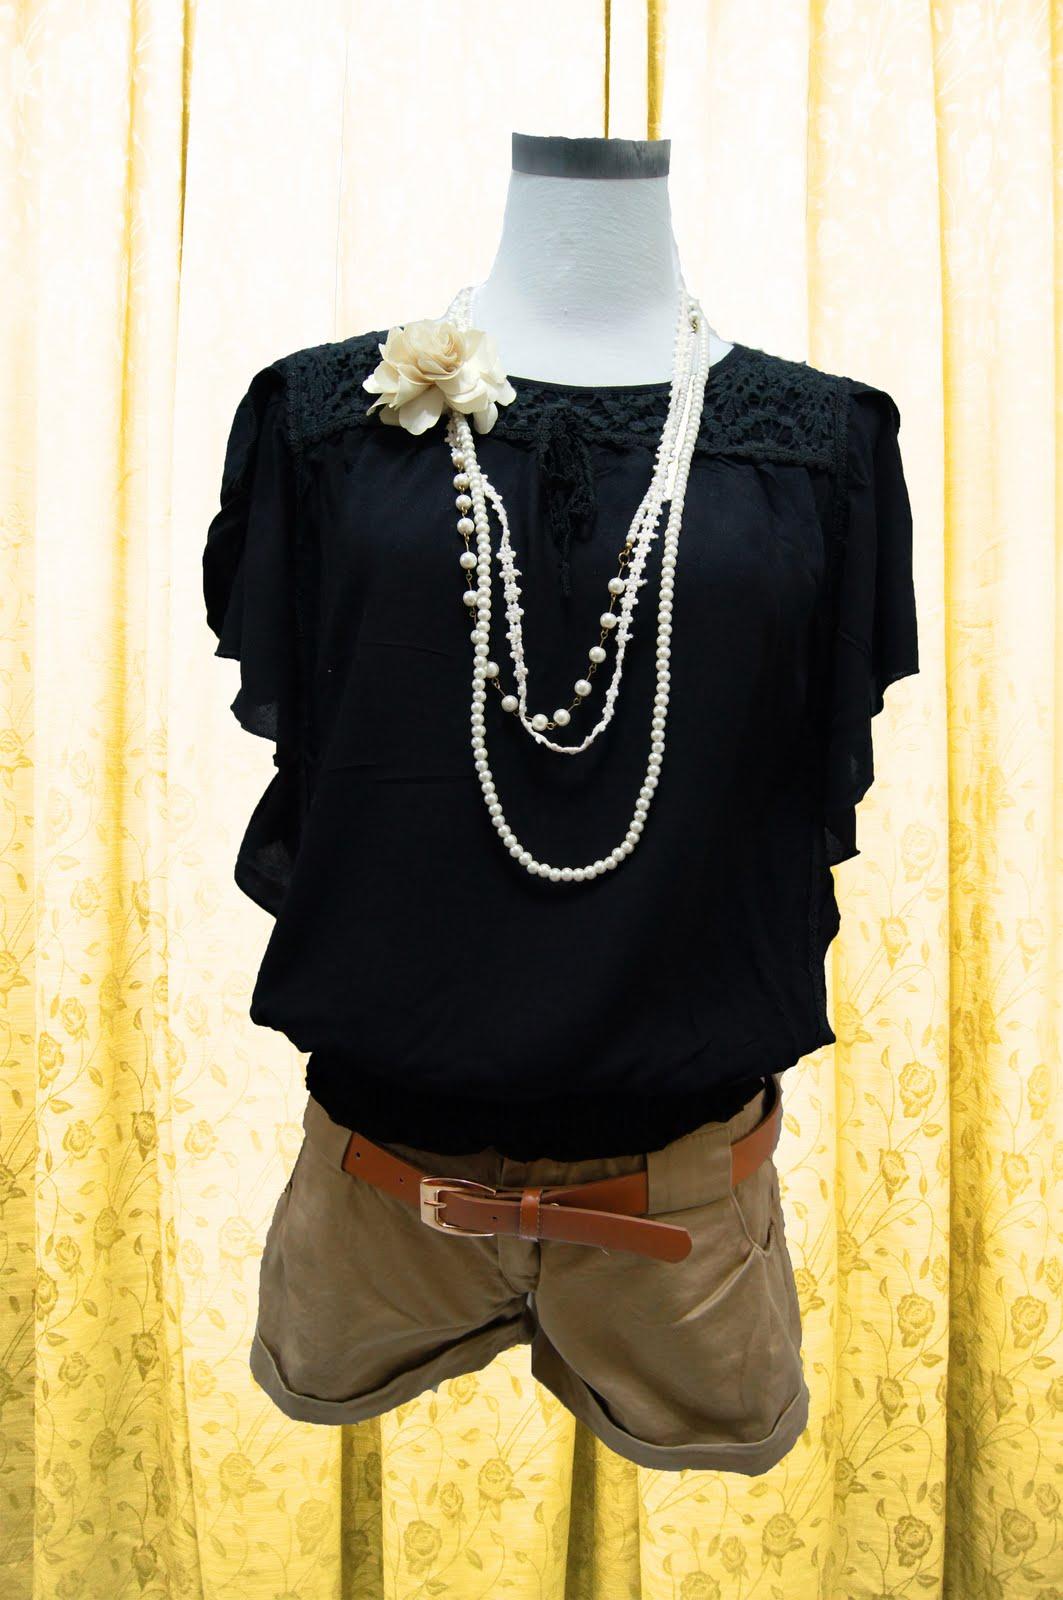 Aeiloveu Elegant Evening Blouse Top